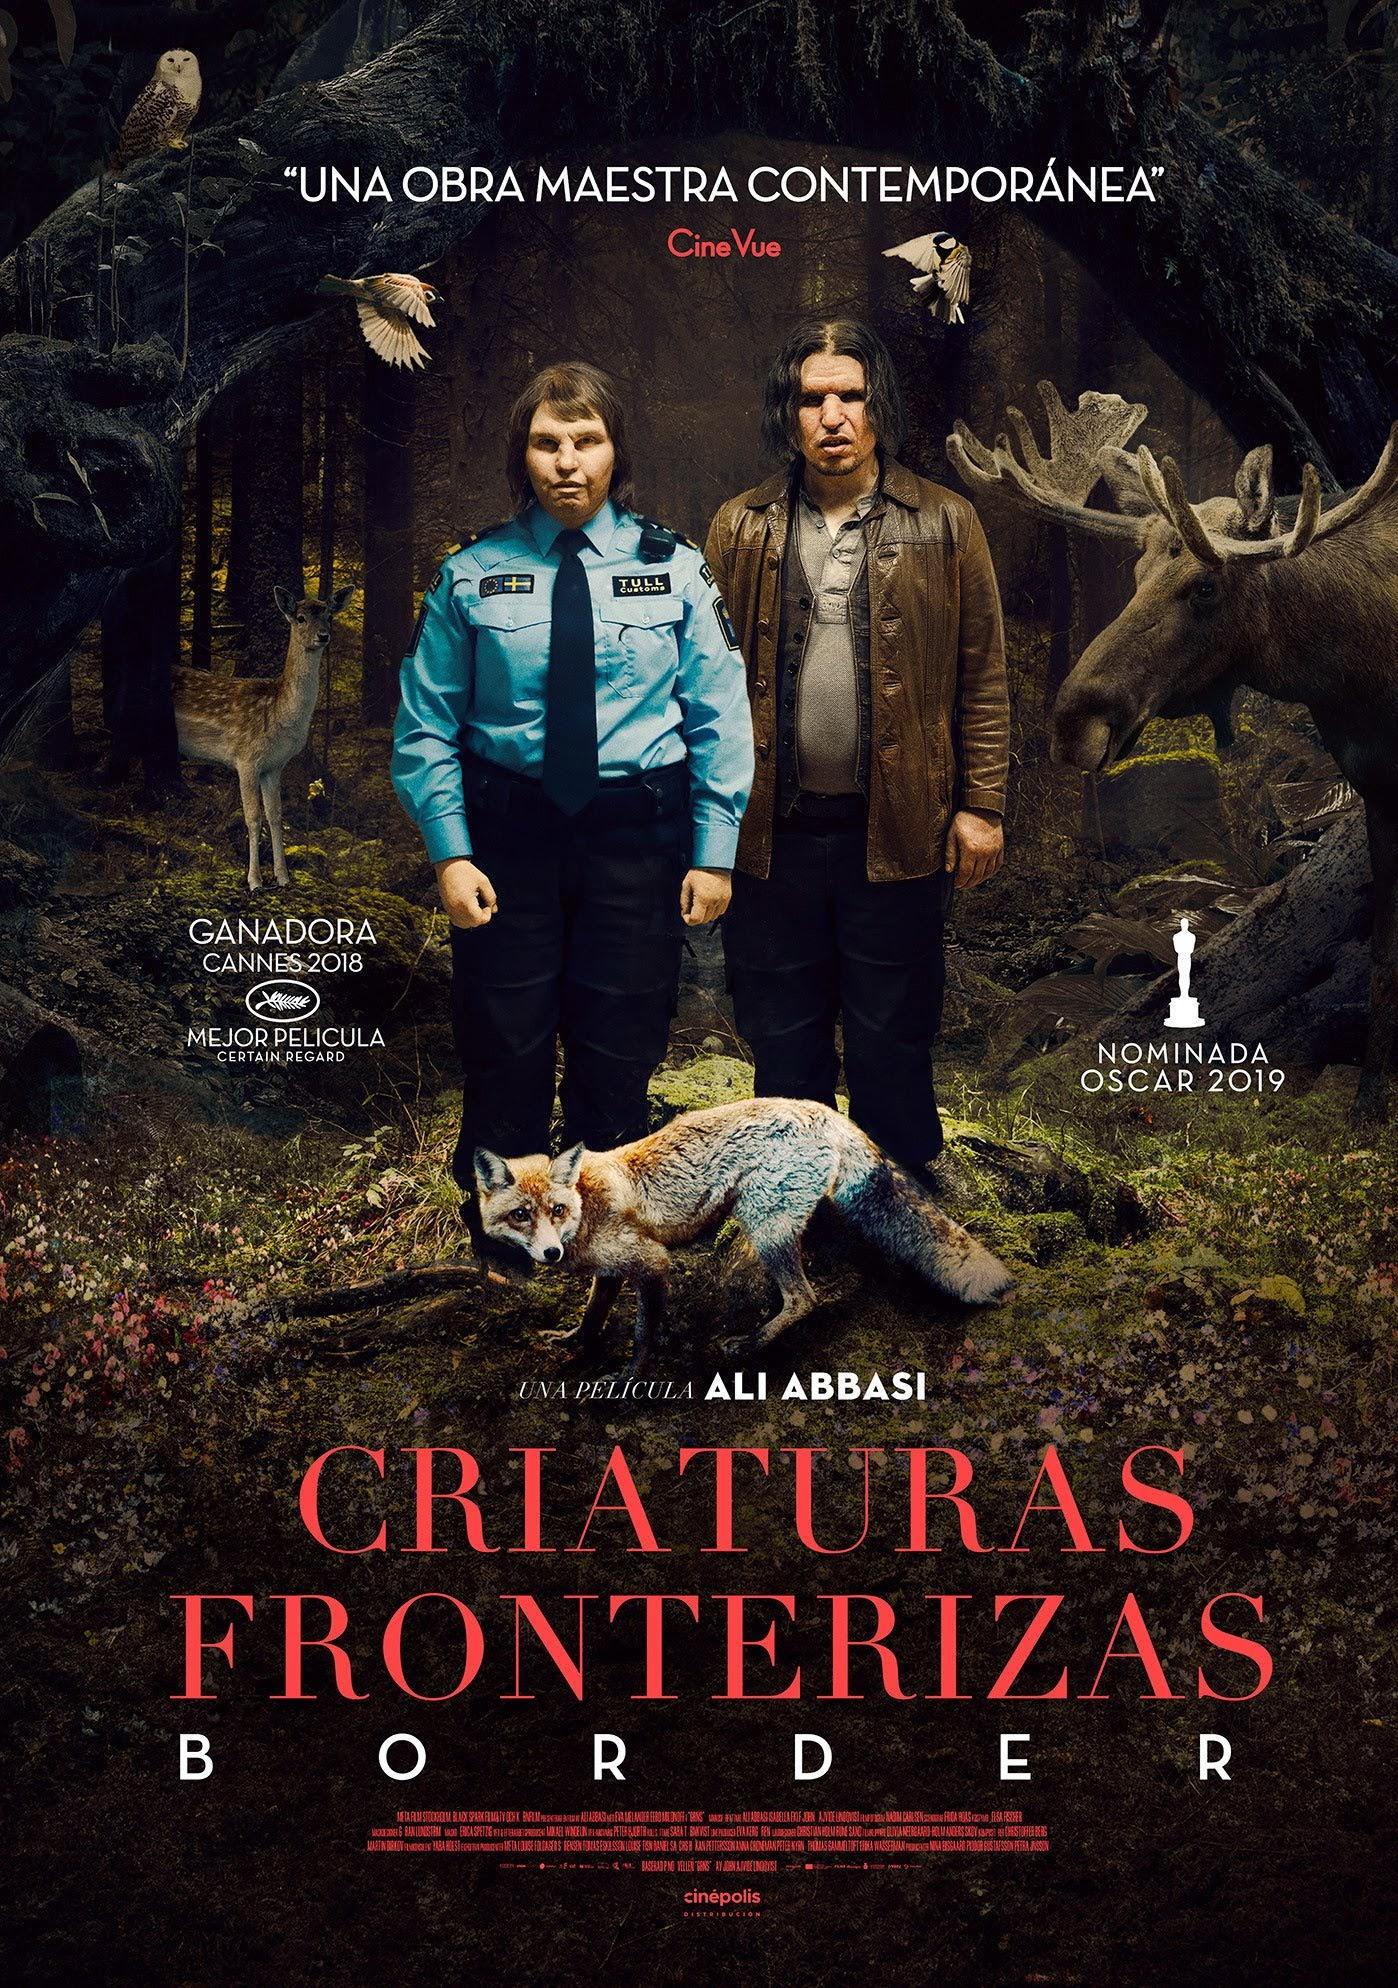 Criaturas Fronterizas Border